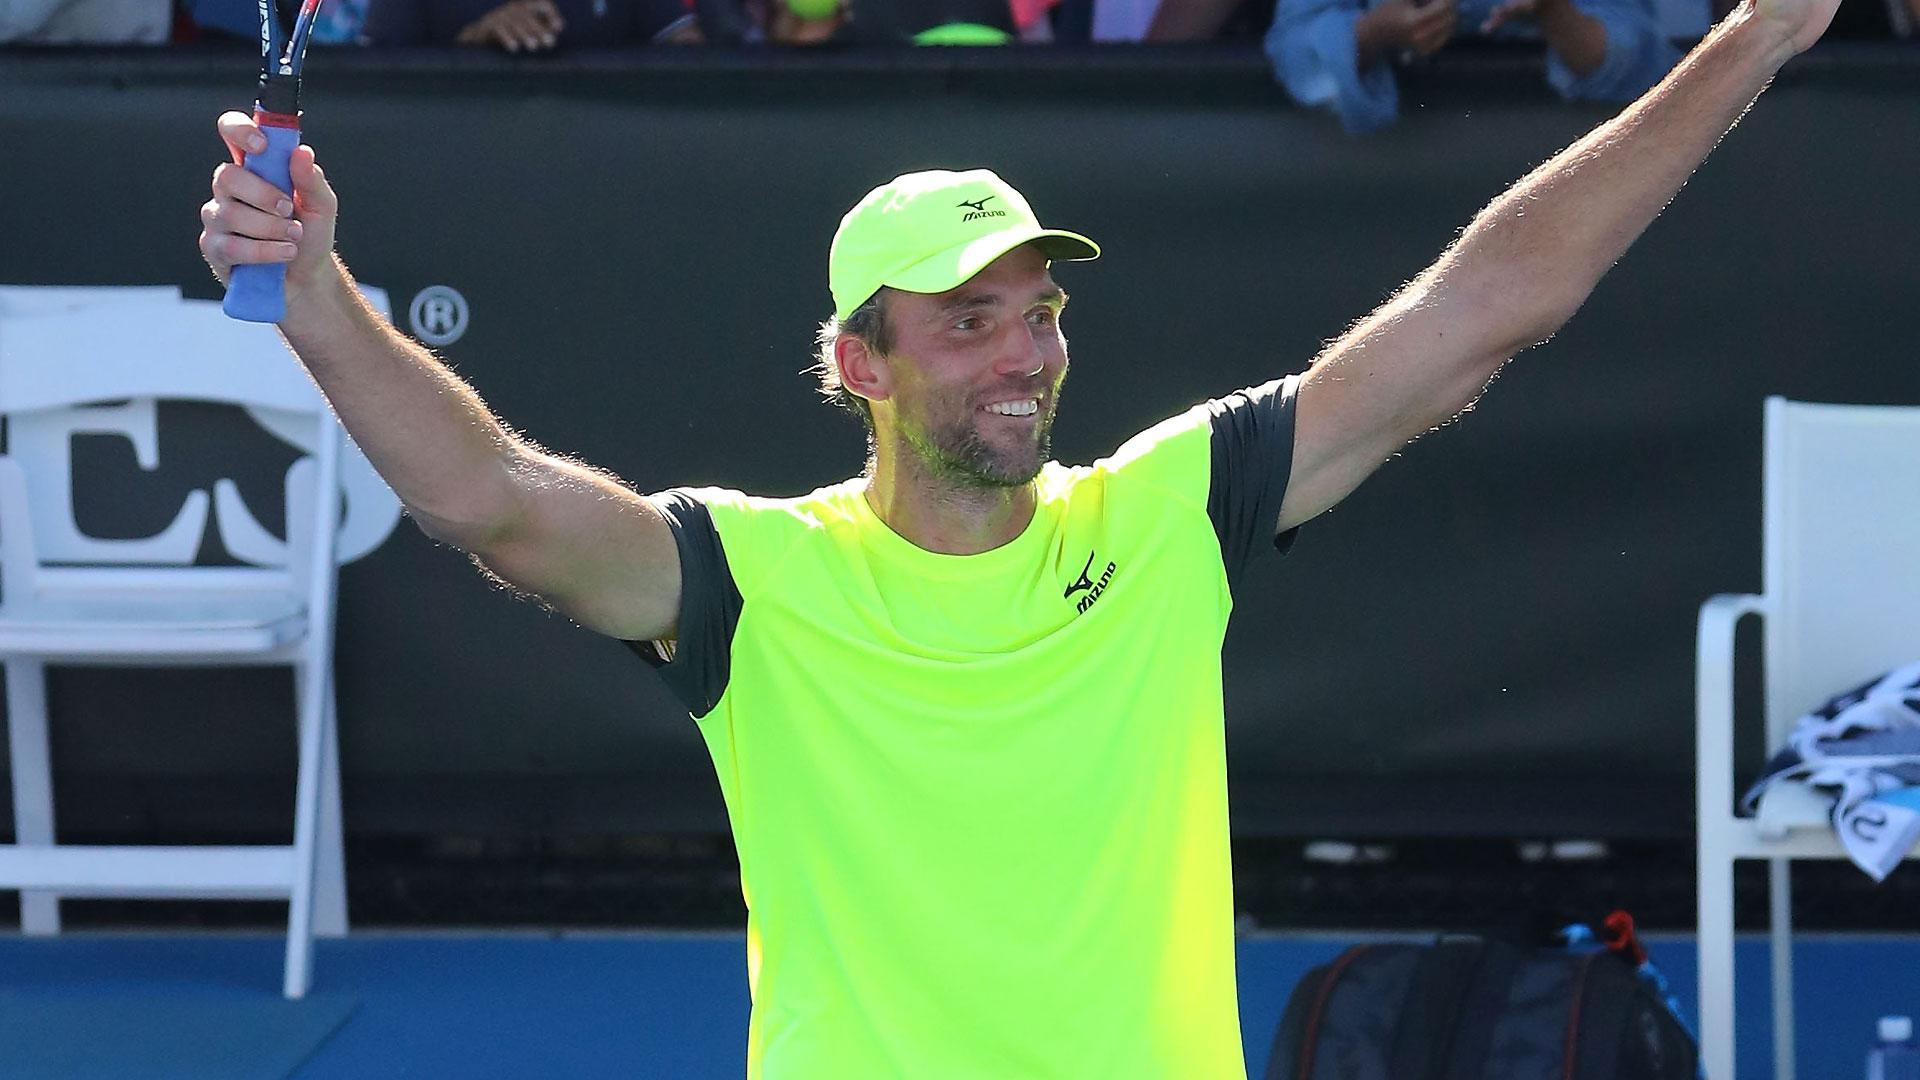 Tennis' elder statesman Karlovic not satisfied with just an ATP wins